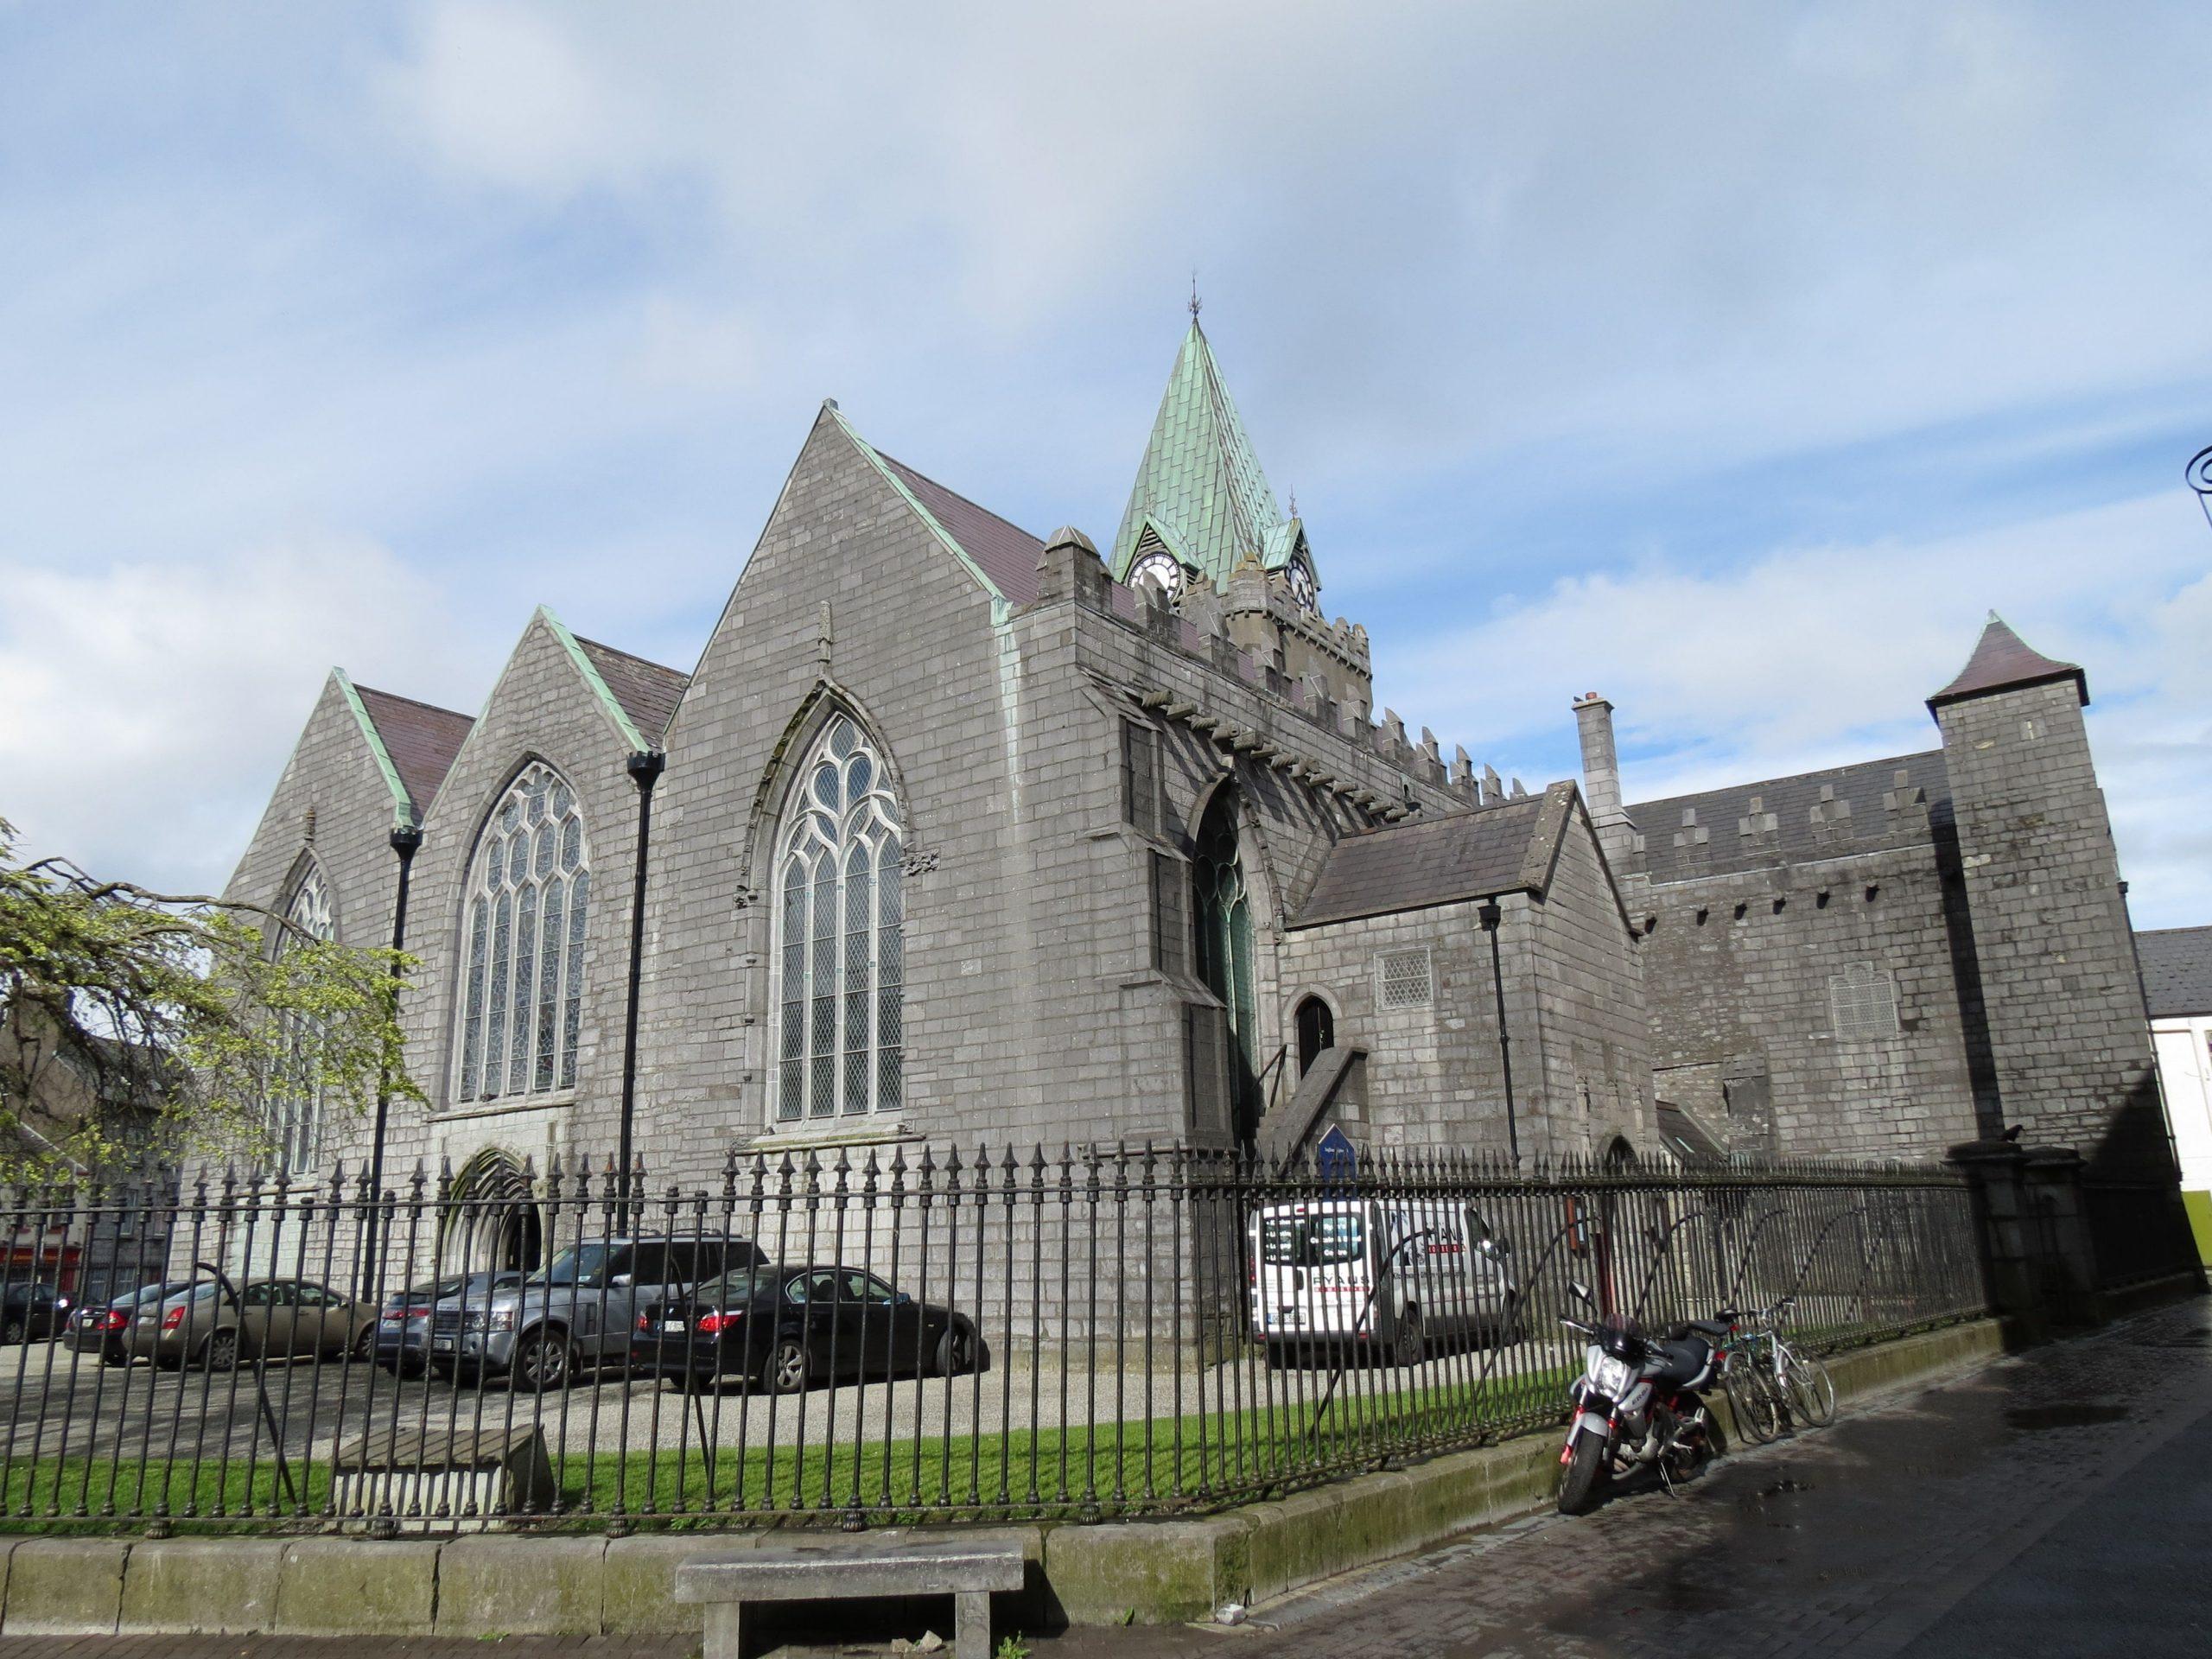 St. Nicholas' Collegiate Church - Visit Galway